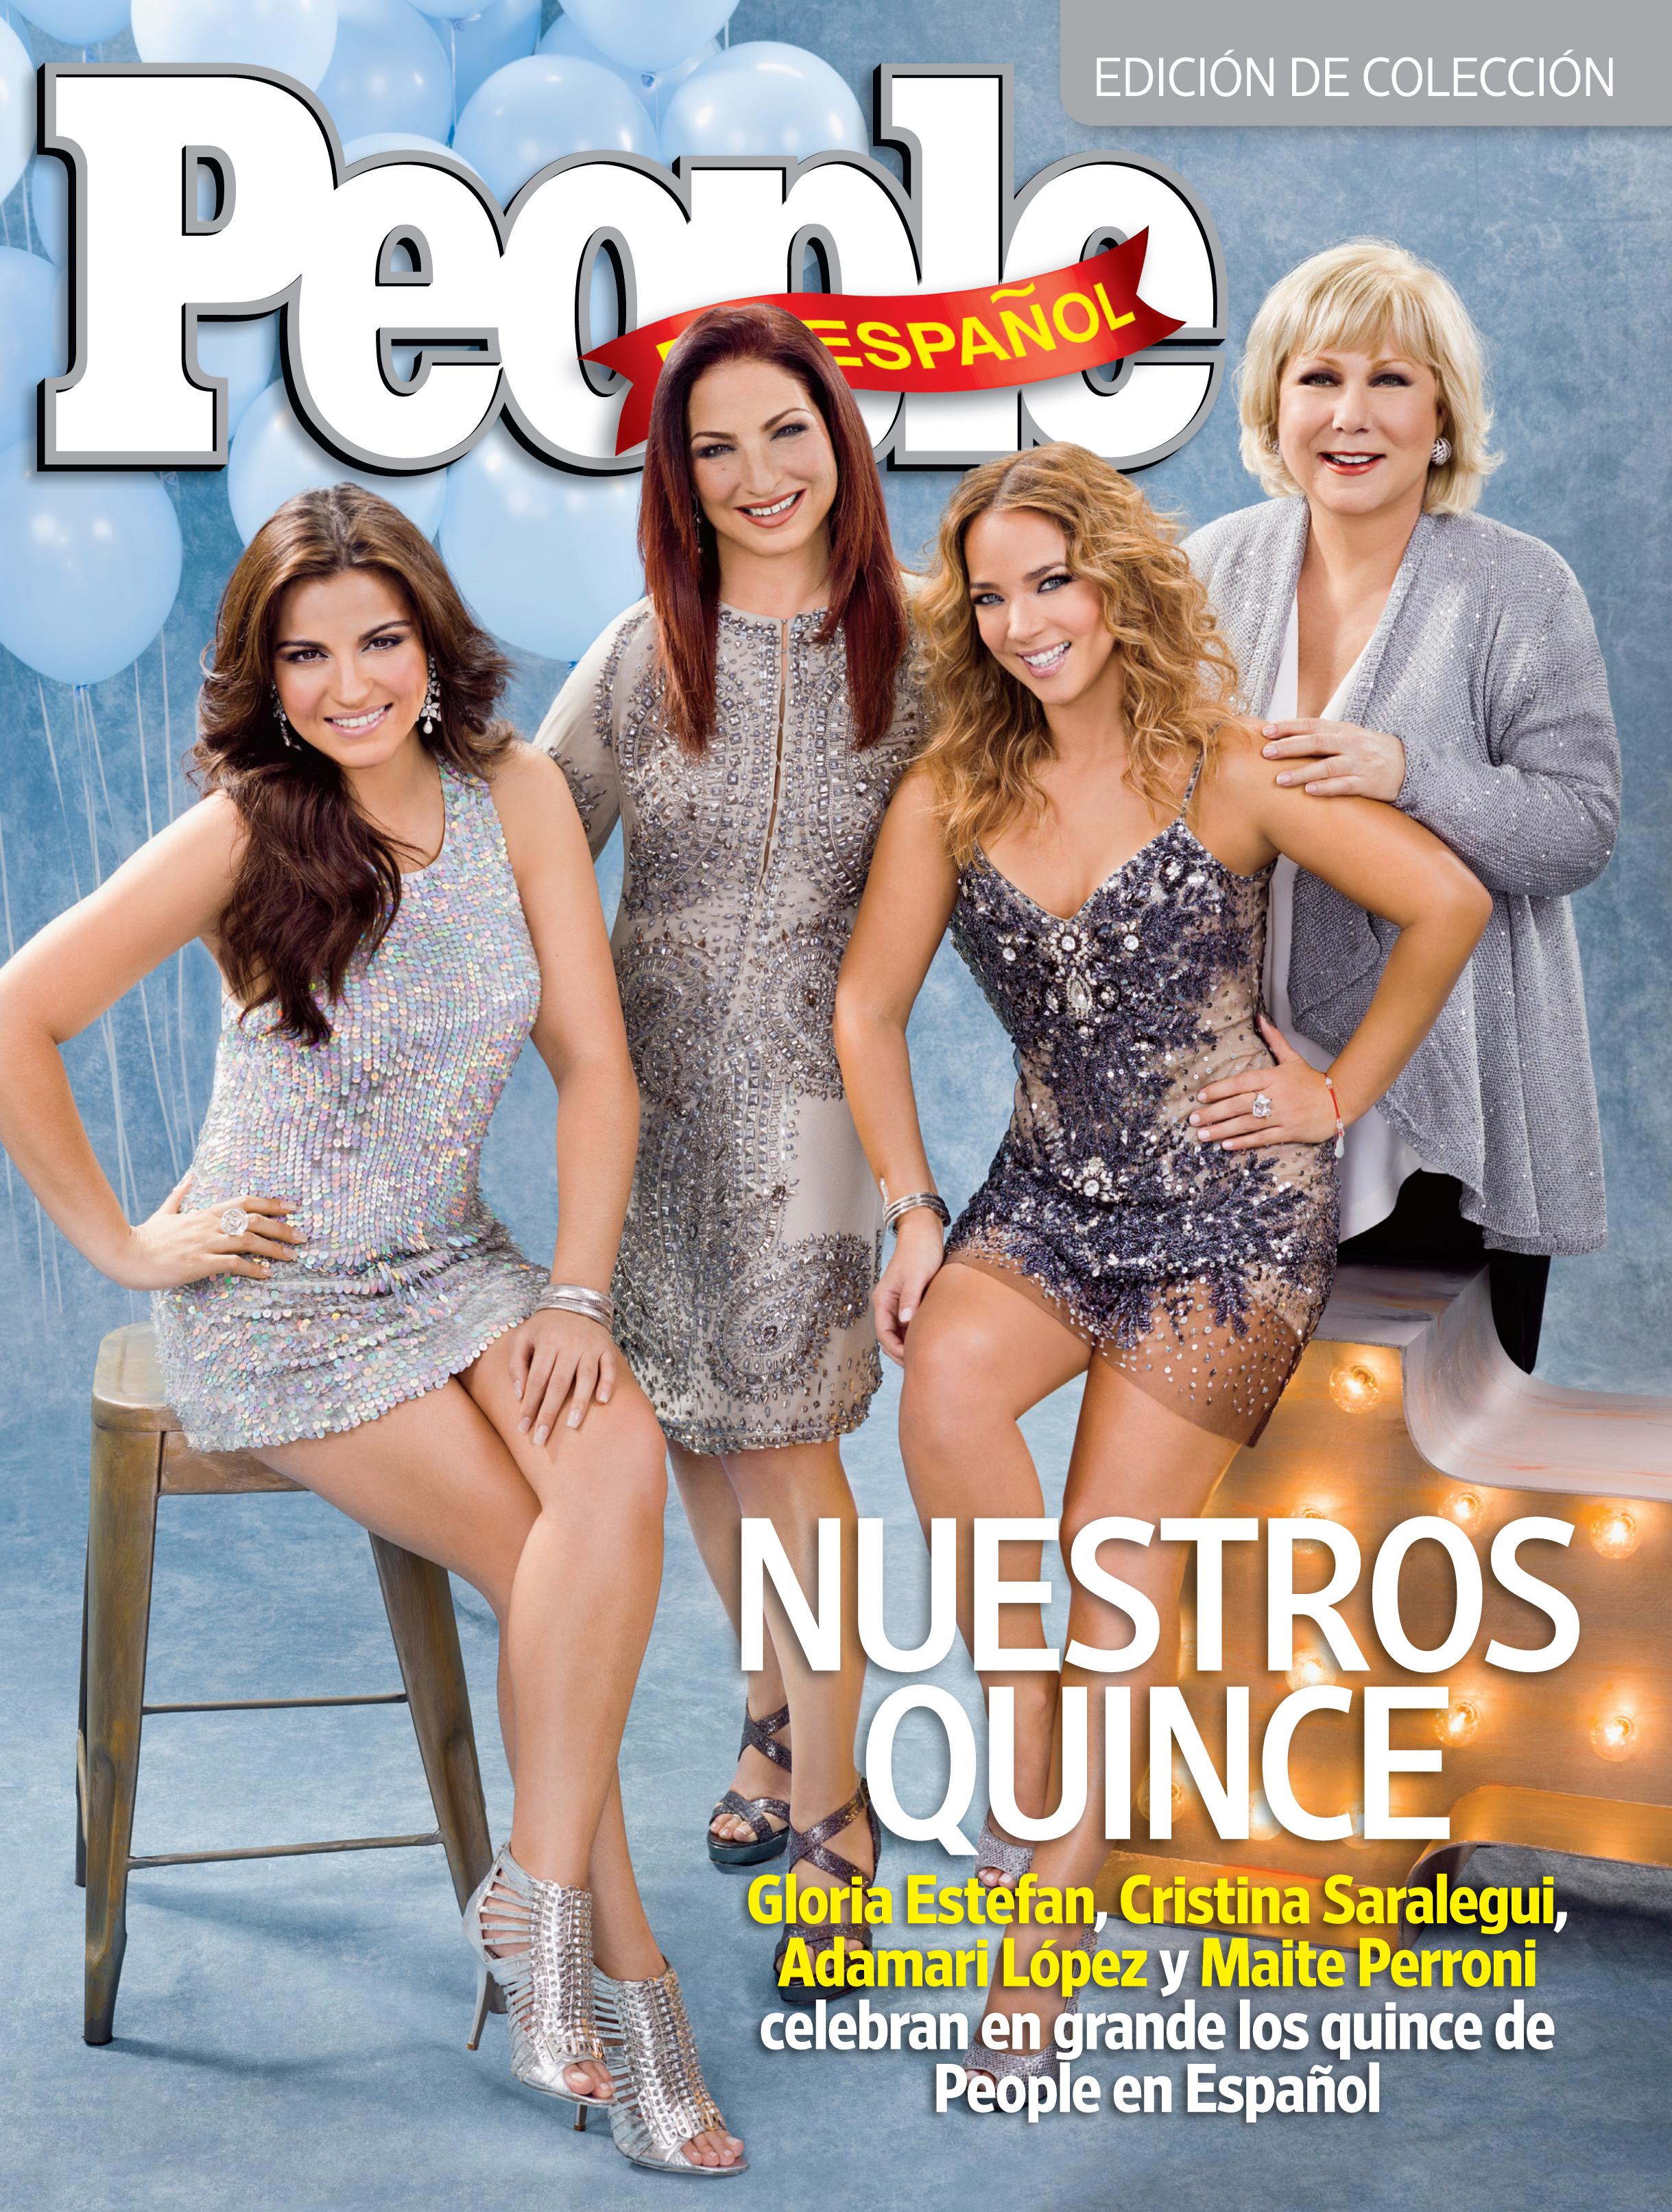 Gloria Estefan, Maite Perroni, Cristina Saralegui y Adamari Lopez - October 201 1